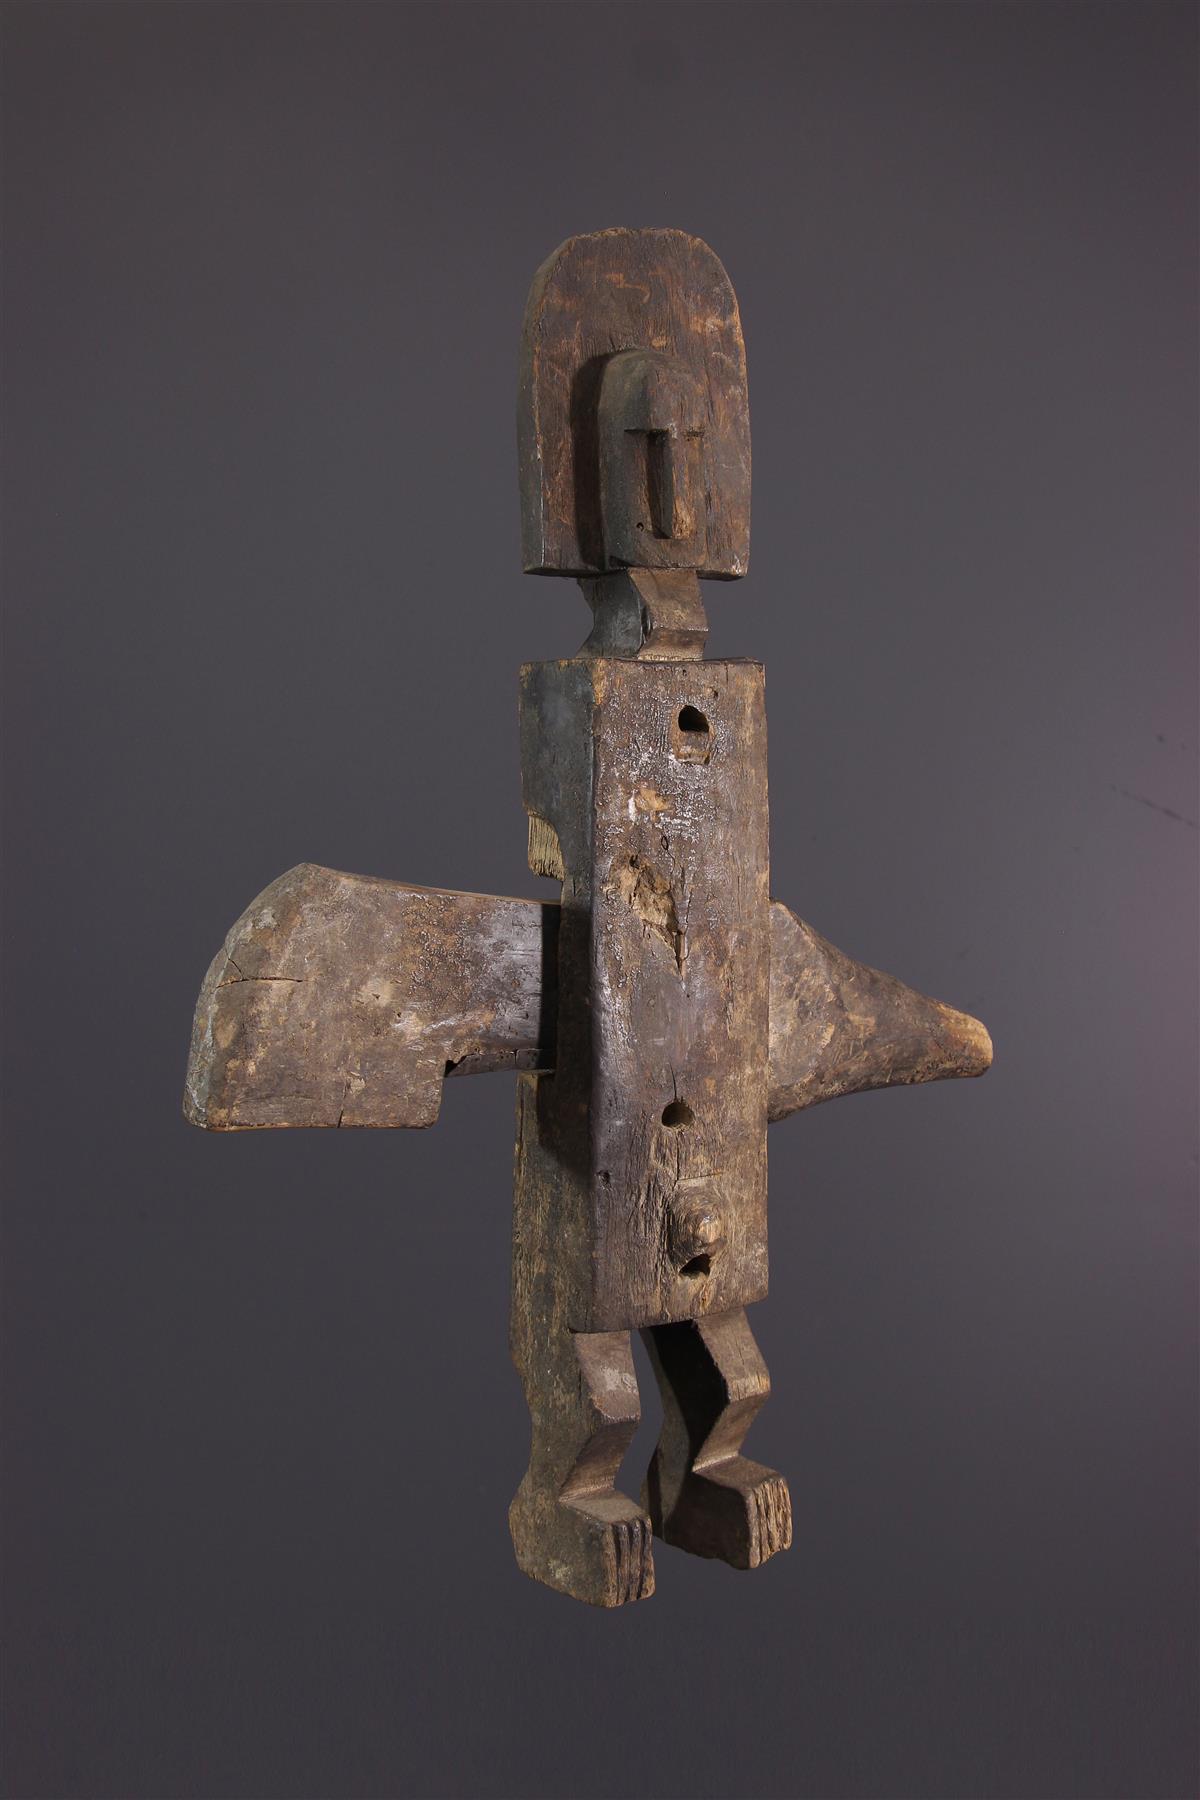 Bambara Lock - African art